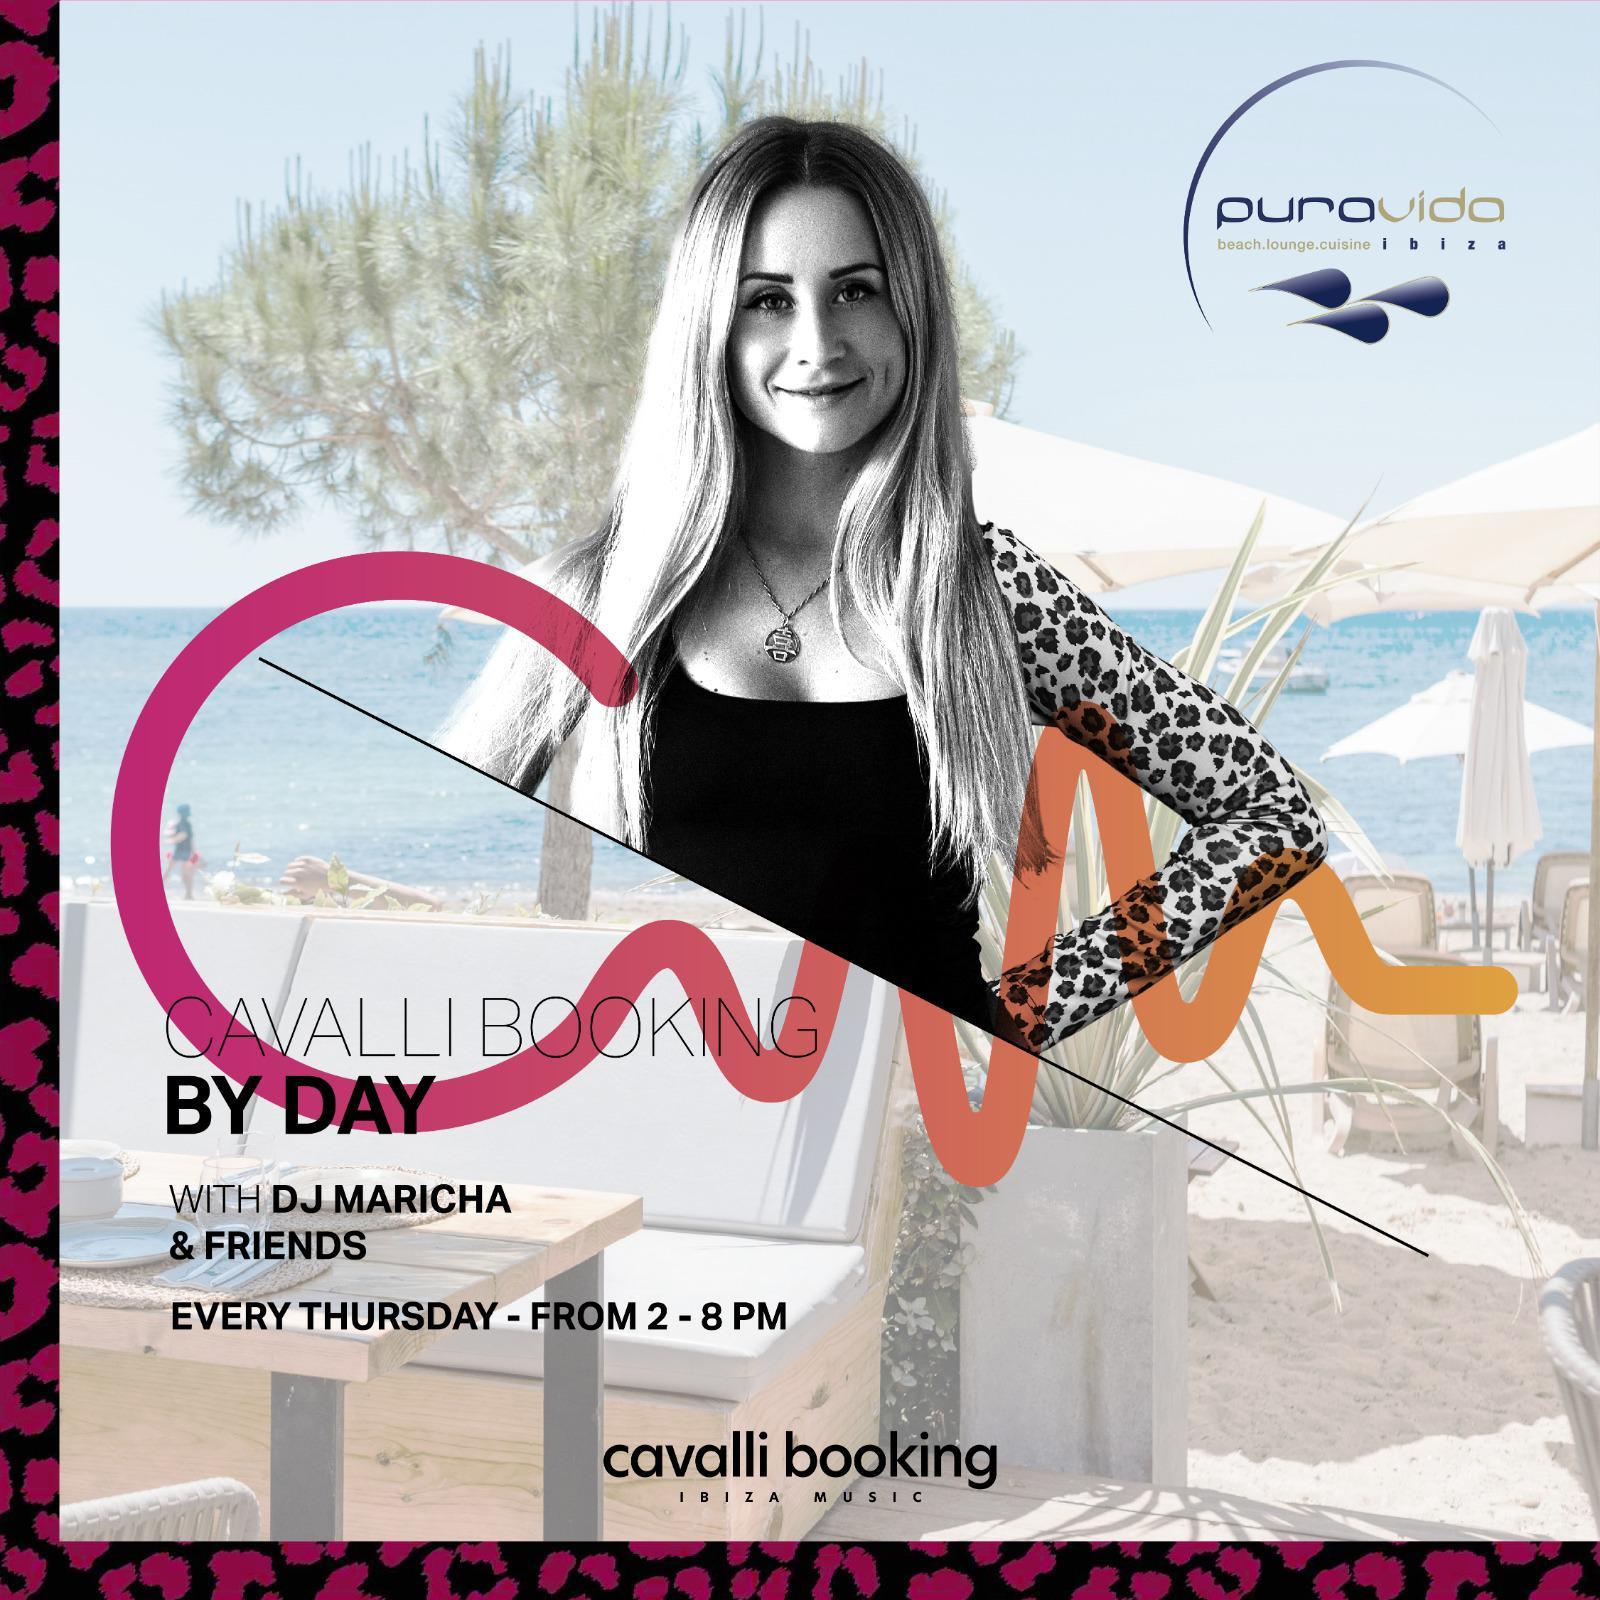 Dj Maricha and friends with Cavalli Booking by Day 2021 at Pura Vida Beach club